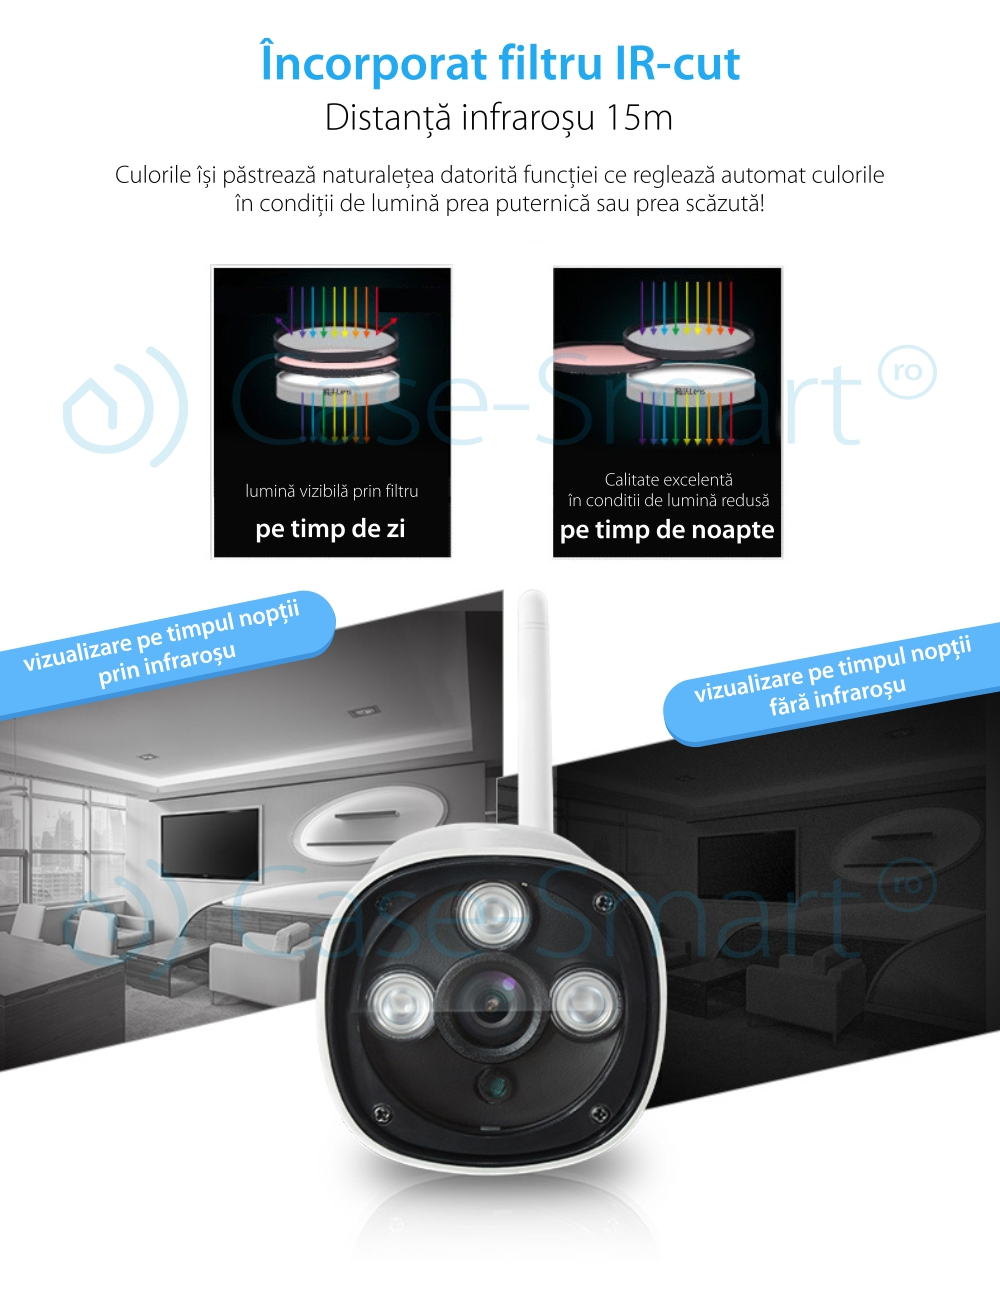 Camera inteligenta cu IP de exterior, rezistenta la apa EasyN